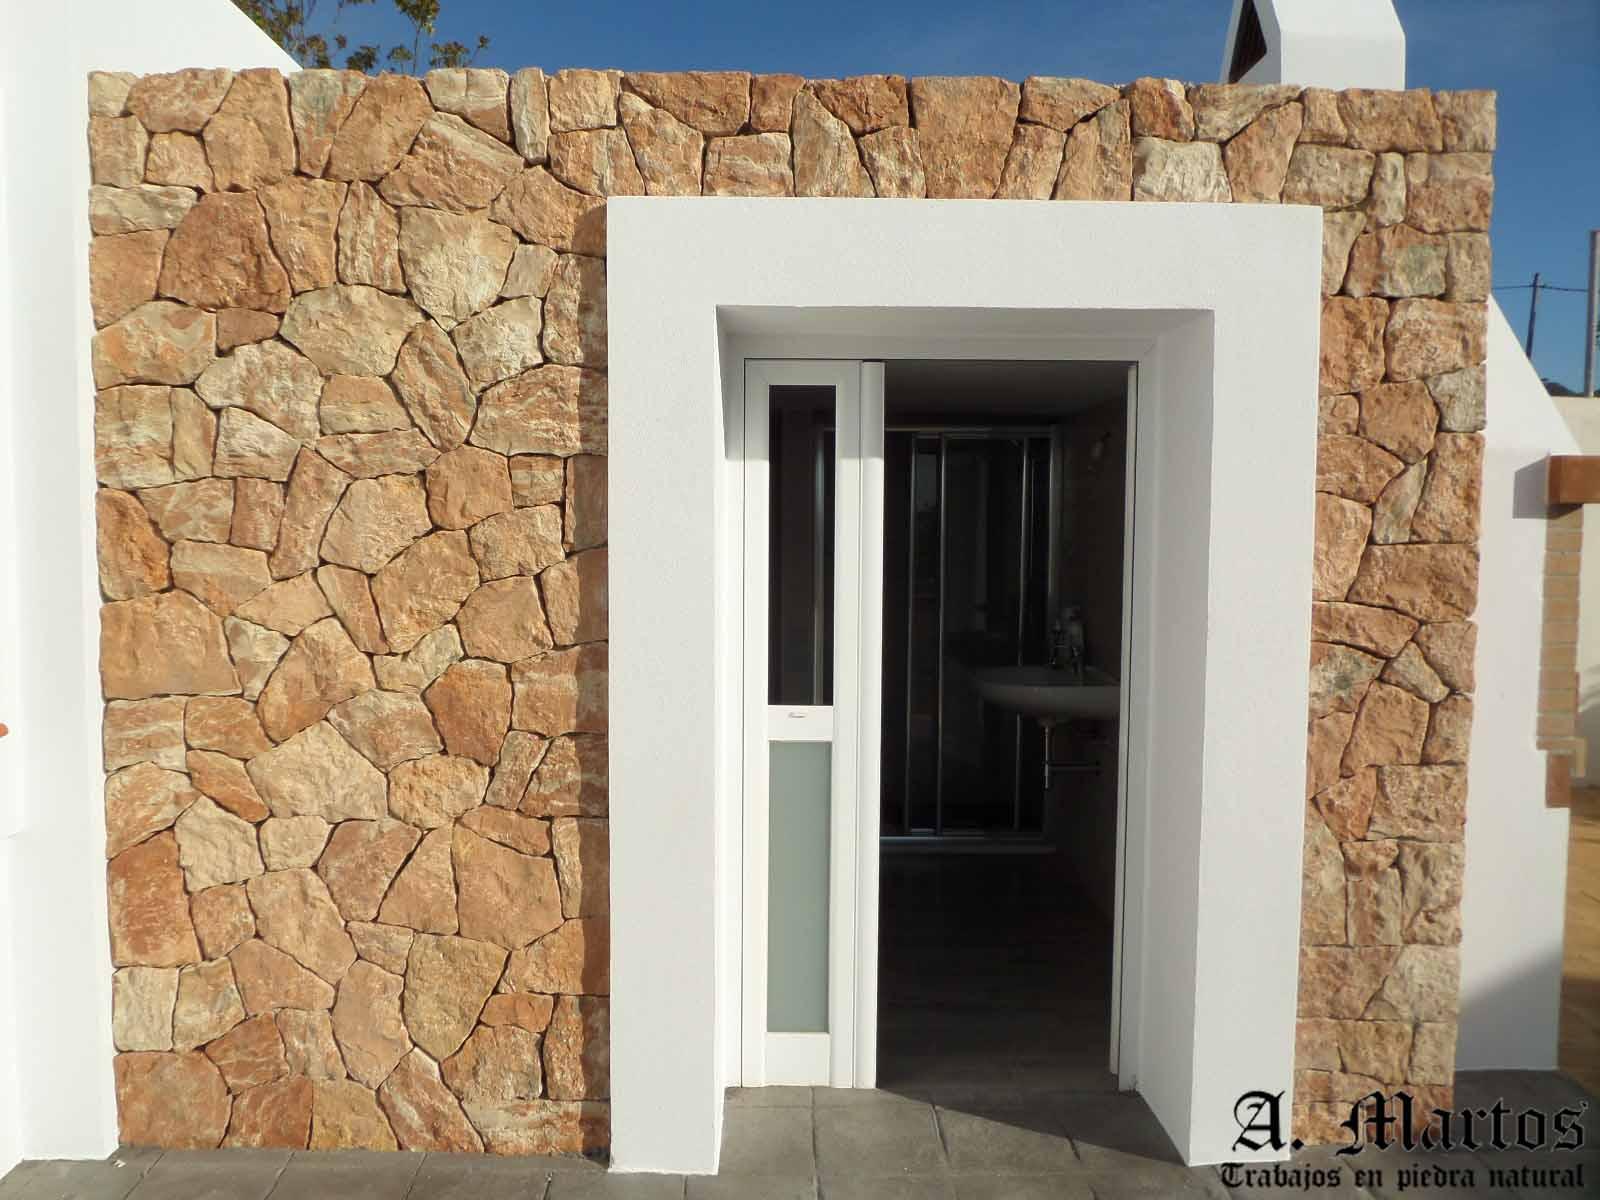 http://picapedreroibiza.com/wp-content/uploads/2017/03/piedra-viva-picapedrero-1.jpg